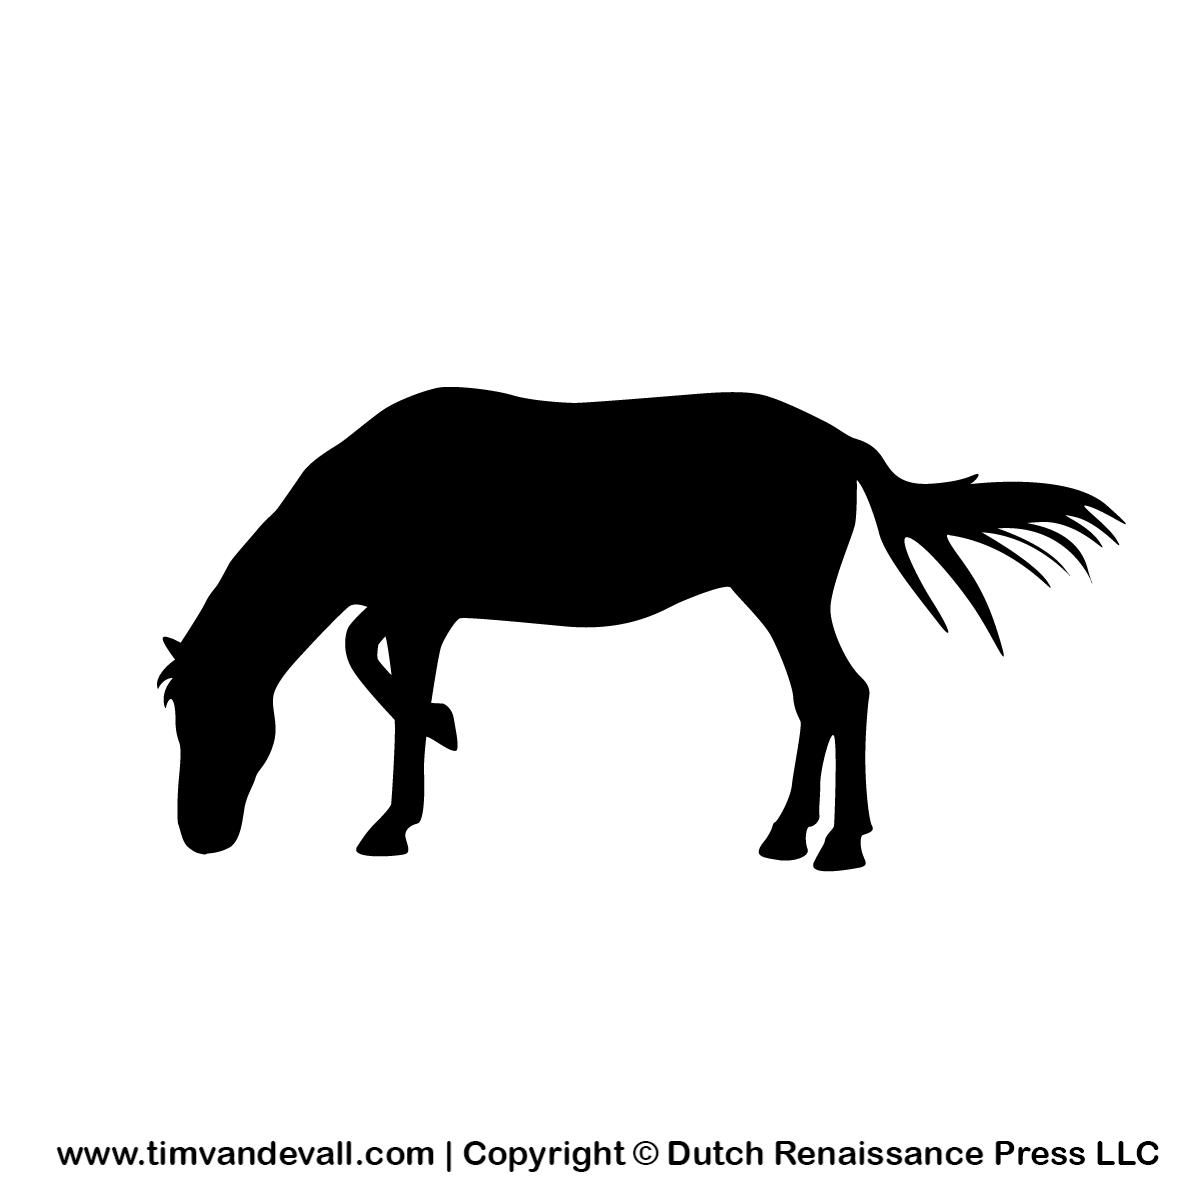 Pics Photos - Horse Silhouette Stencil Hd Picture